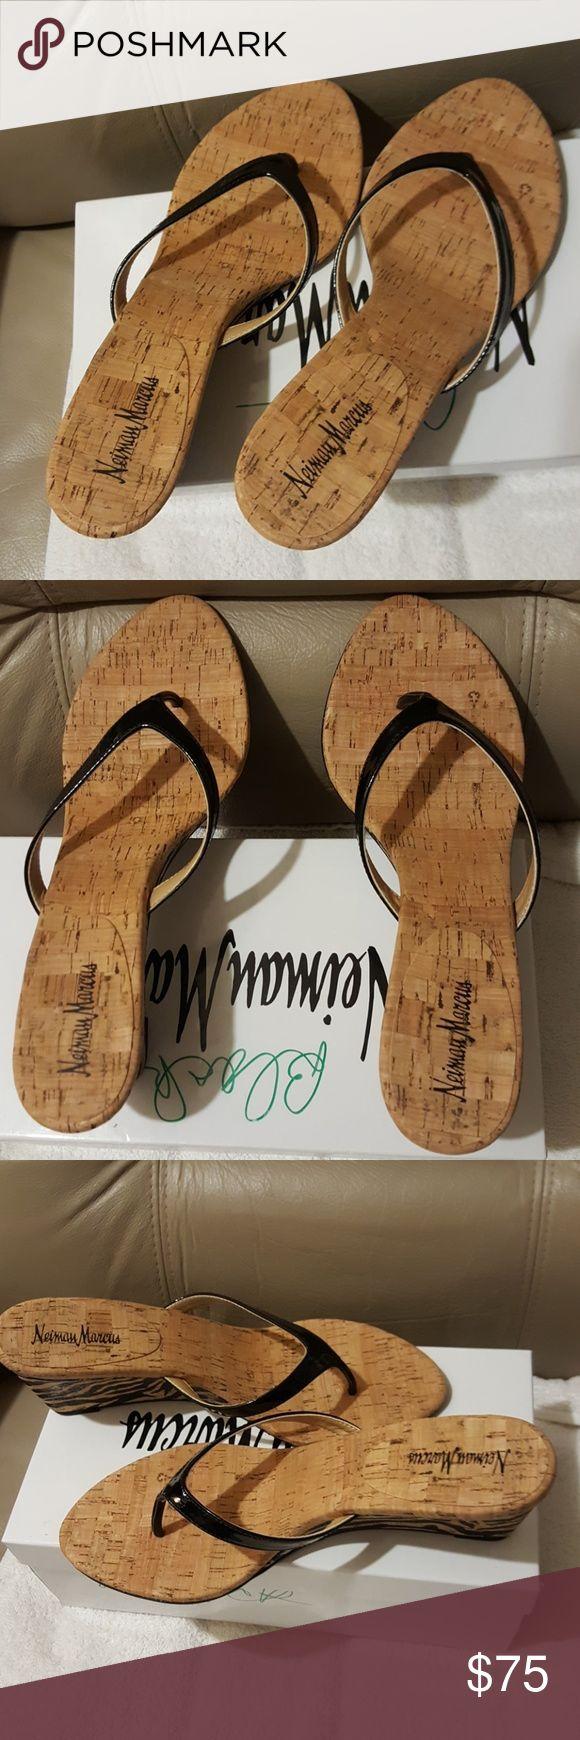 Neiman Marcus black patent splitter wedge sandal Brand new never worn size 10 Neiman Marcus Shoes Sandals